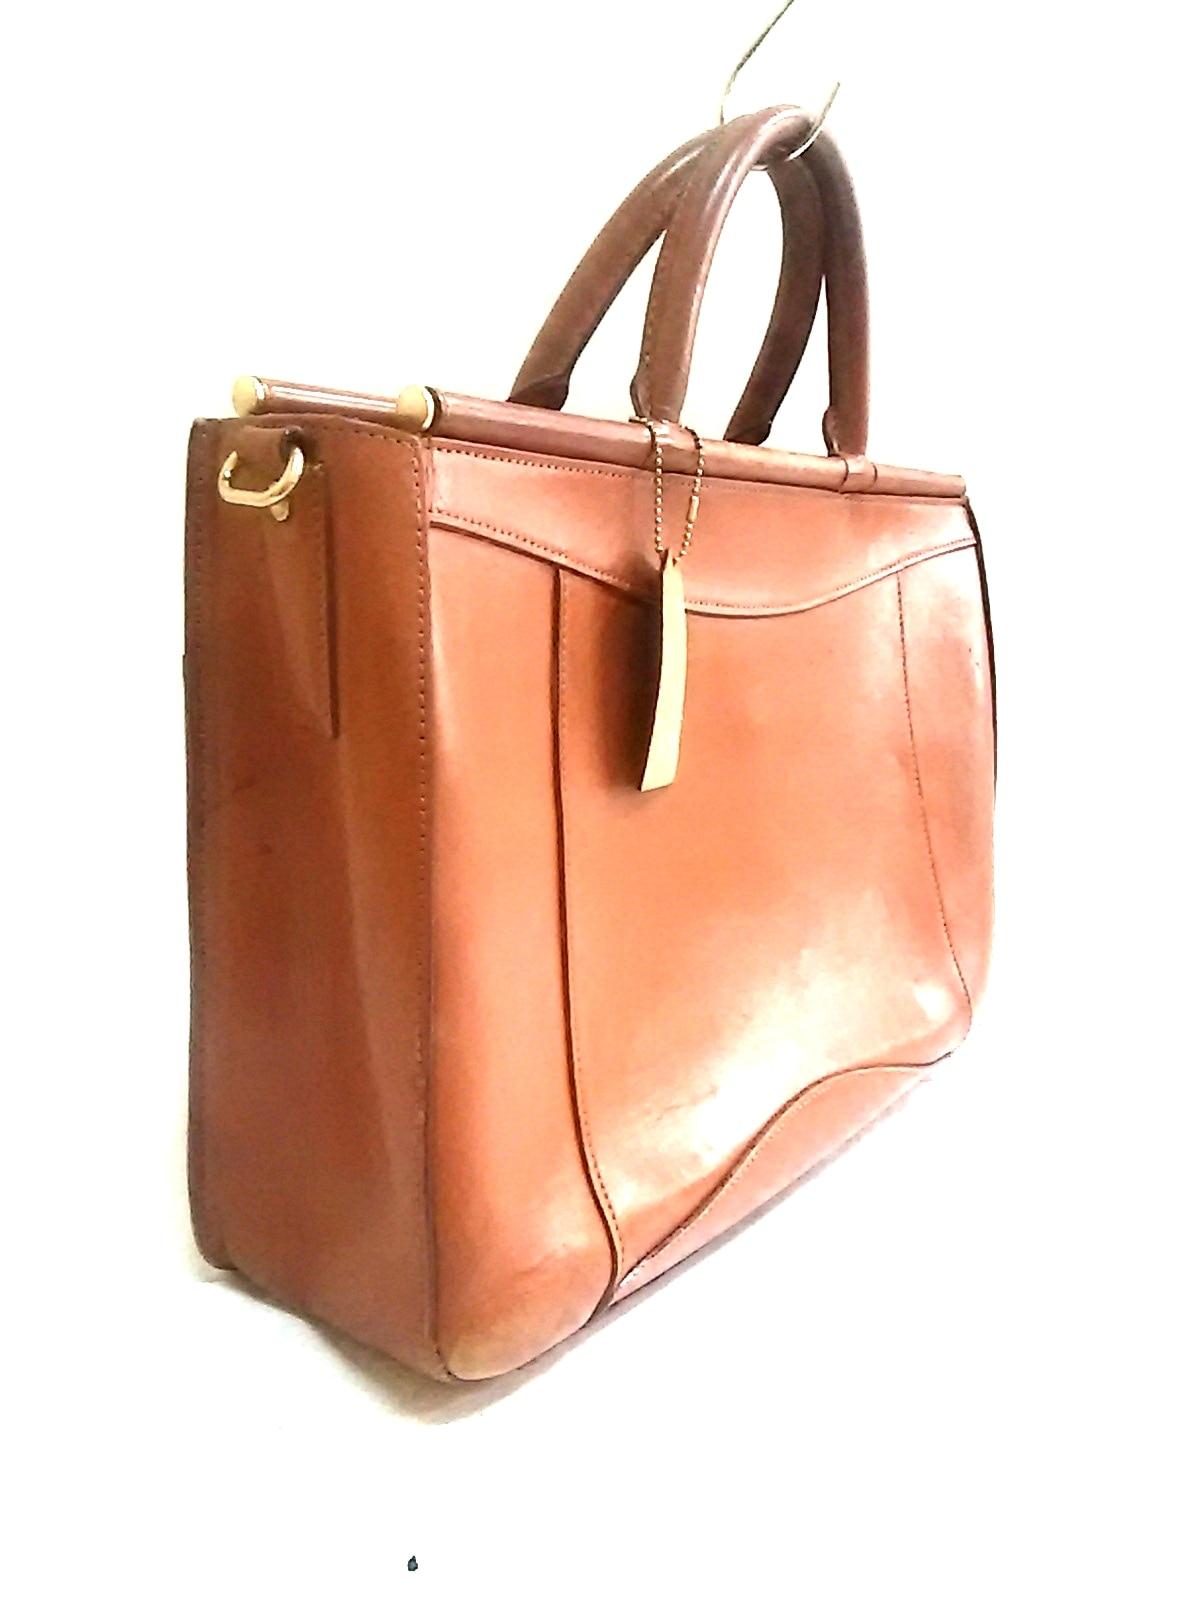 ITAGAKI/Leather Craft by Emi(イタガキ)のビジネスバッグ